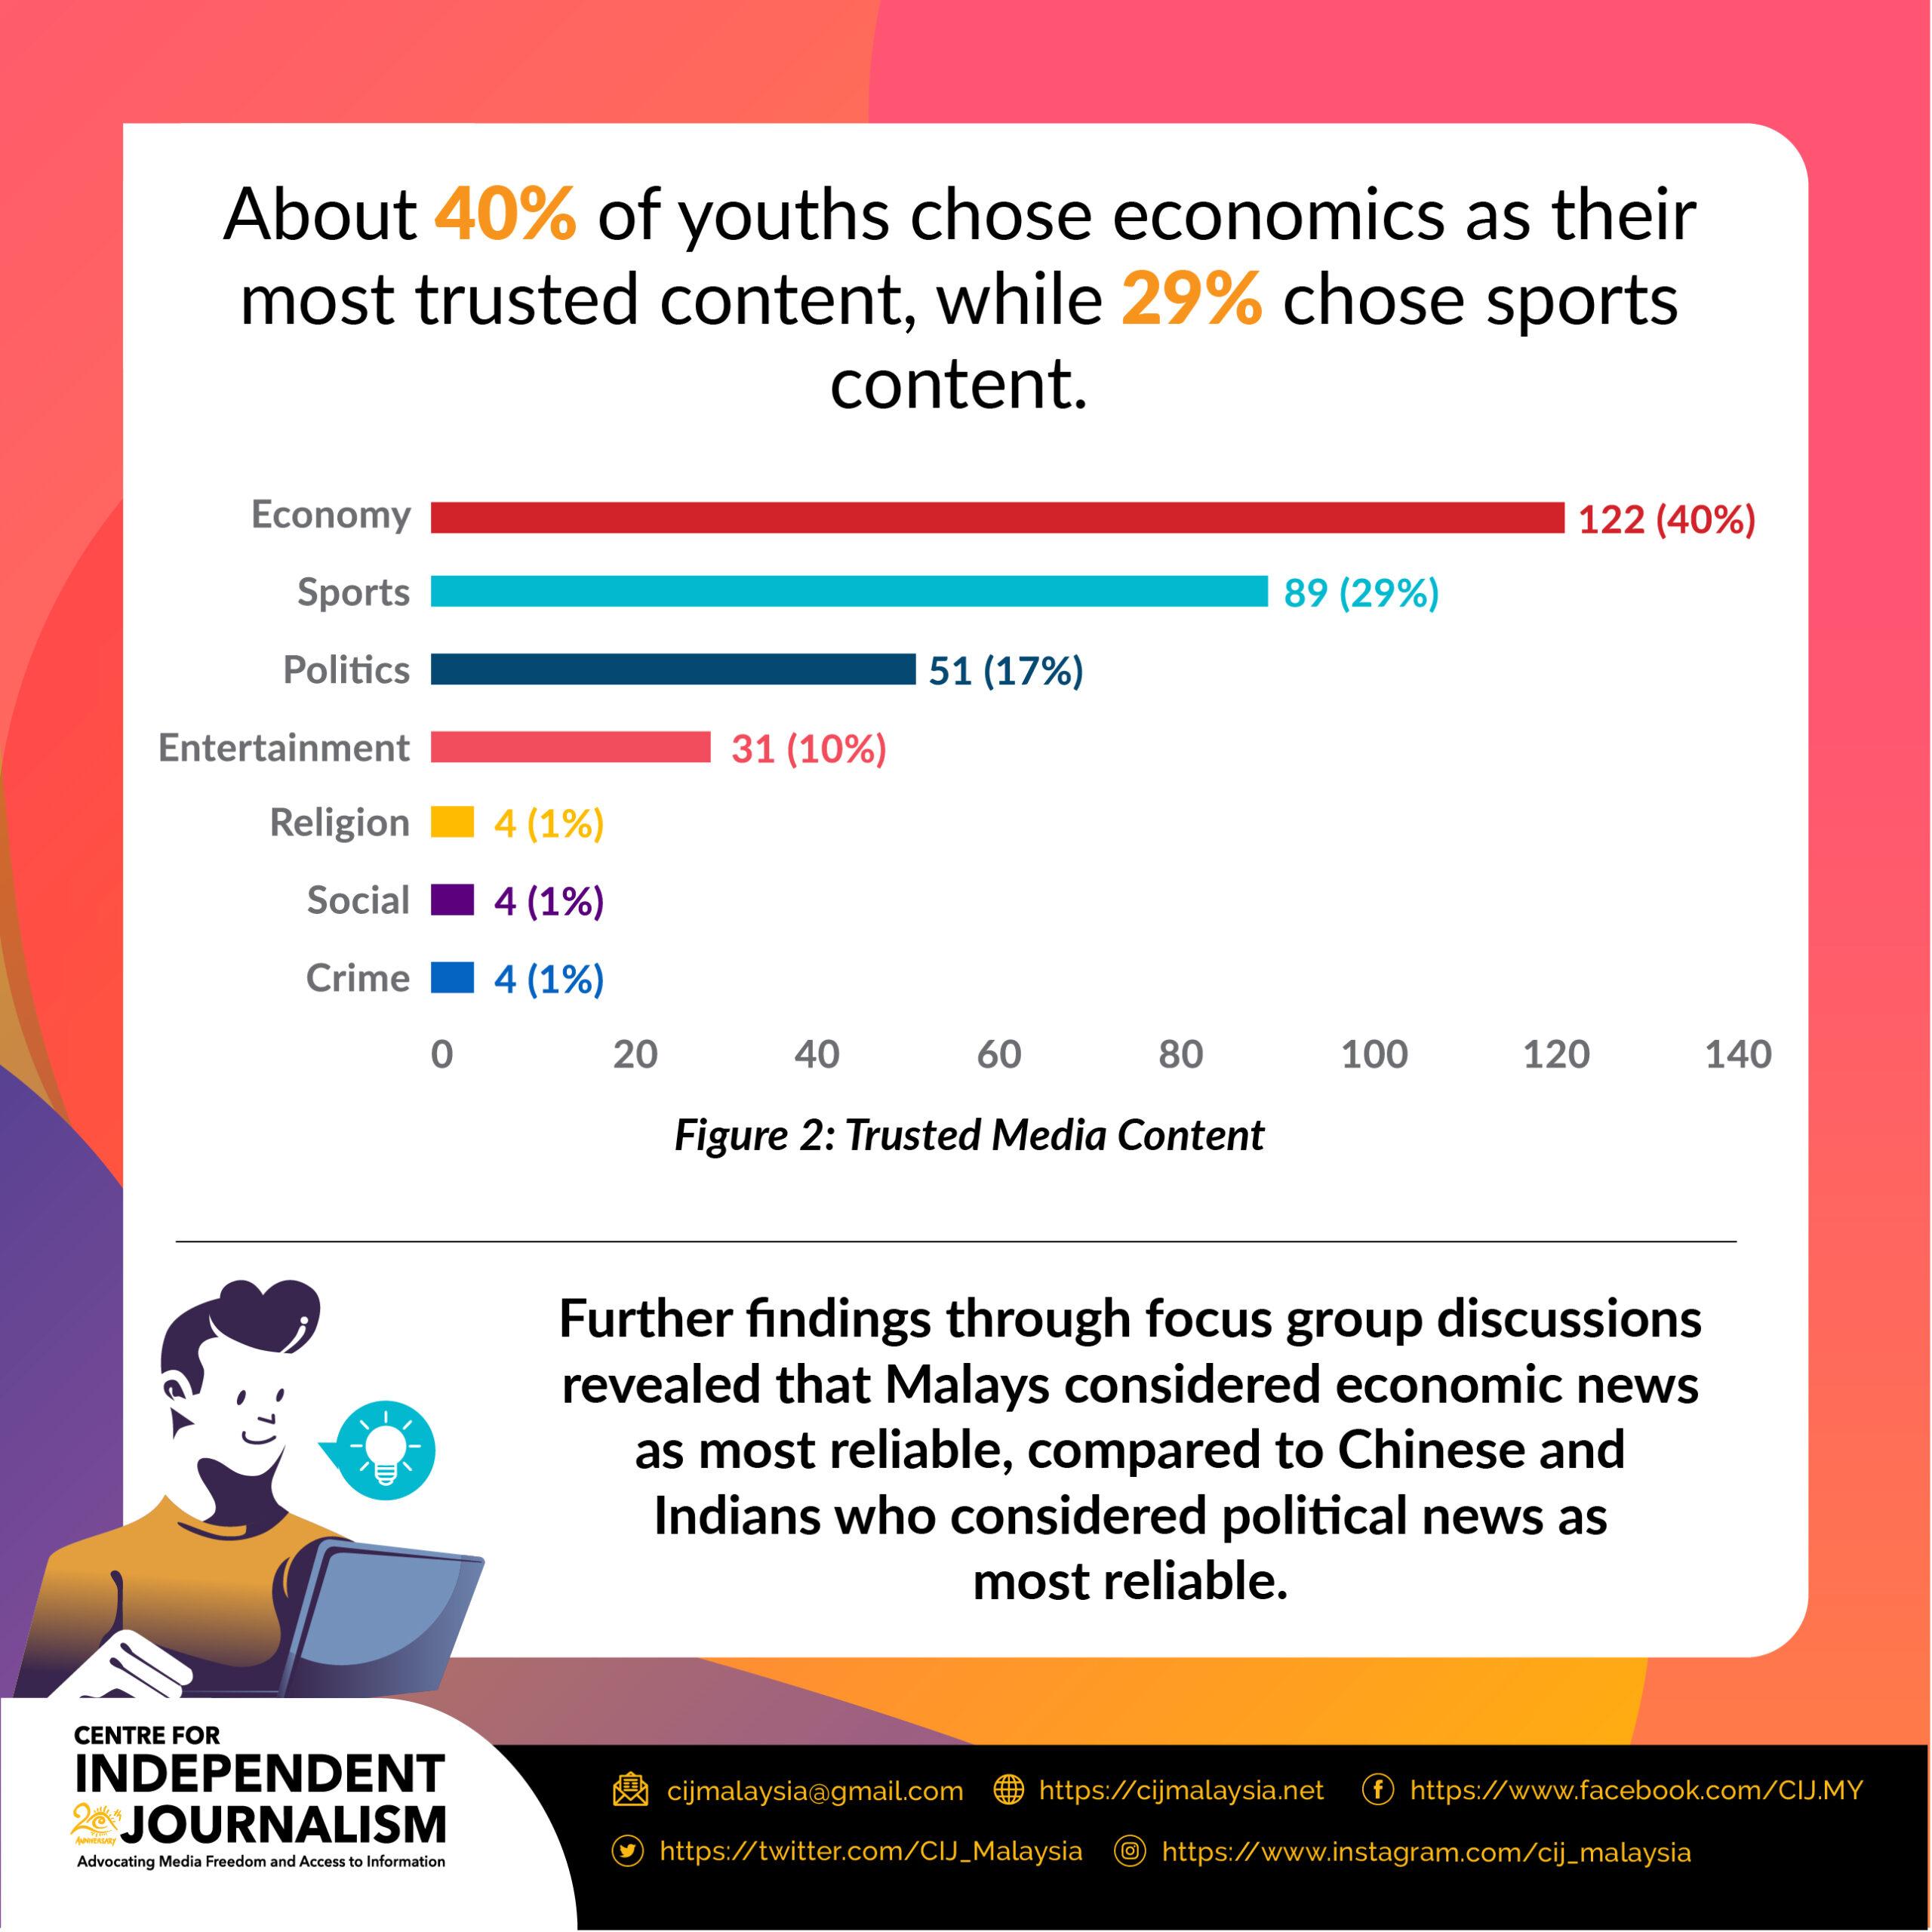 FINAL-IG-FB-Infographic-IEA YOUTH-03